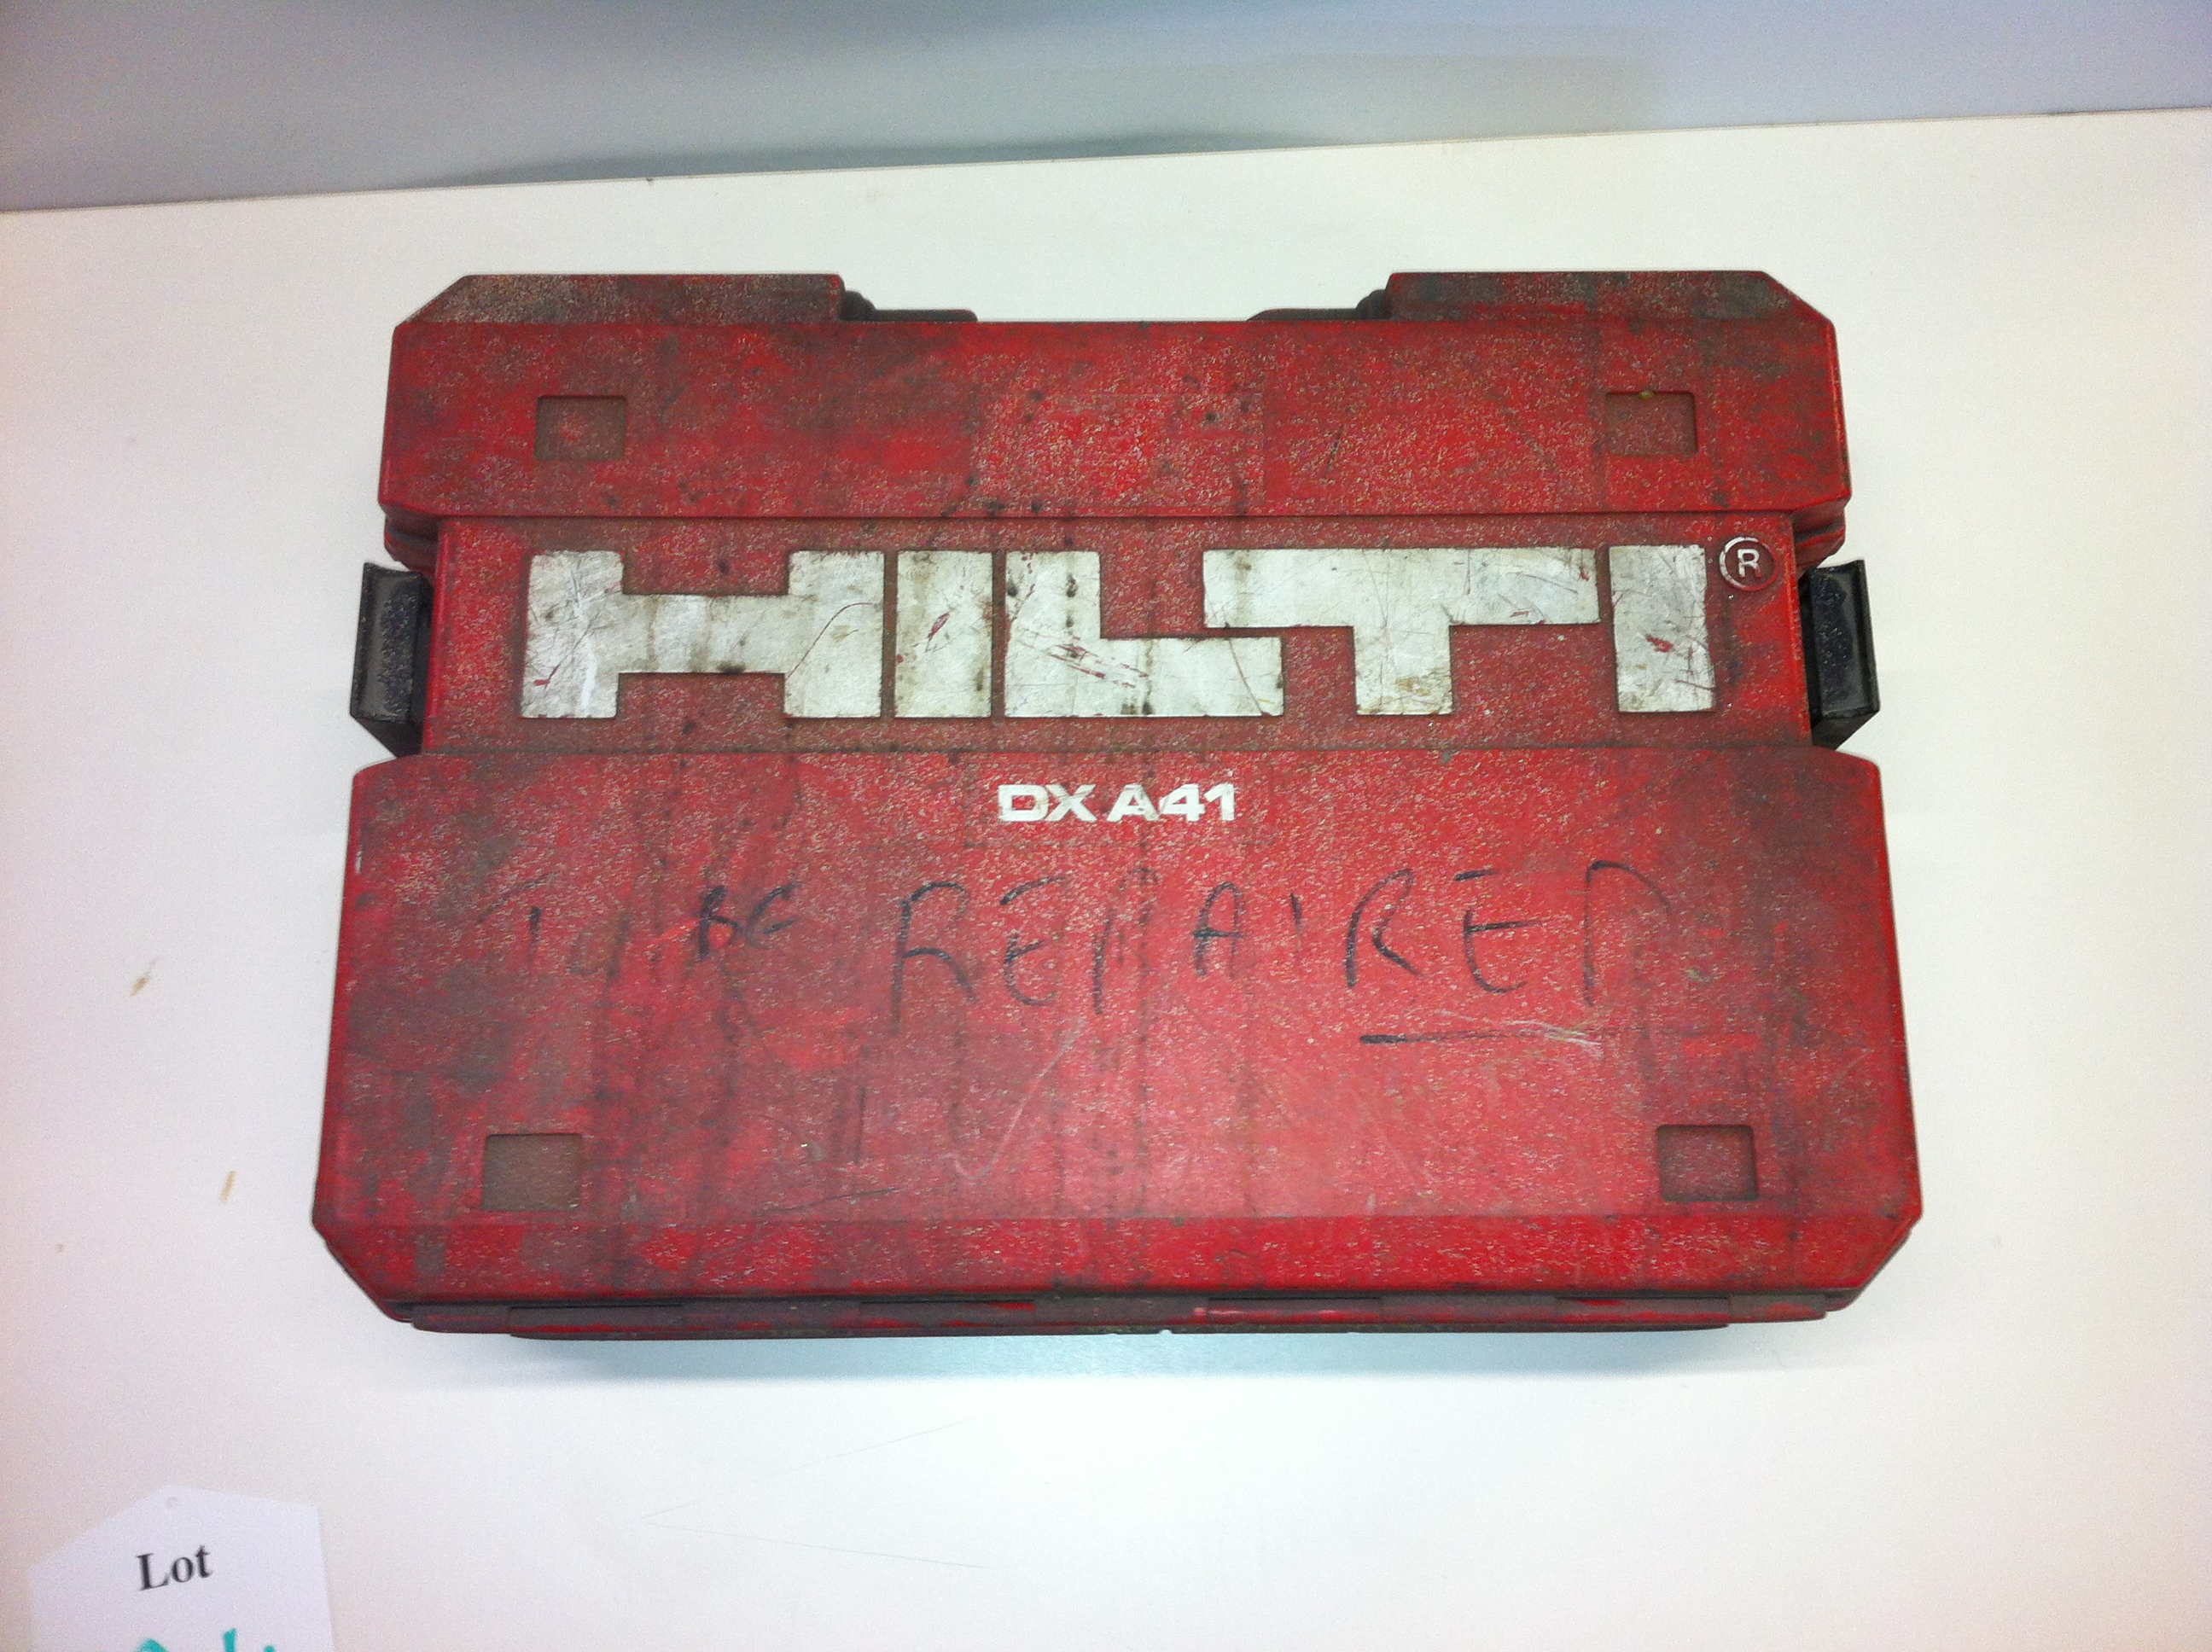 Lot 124 - Hilti Nail Gun